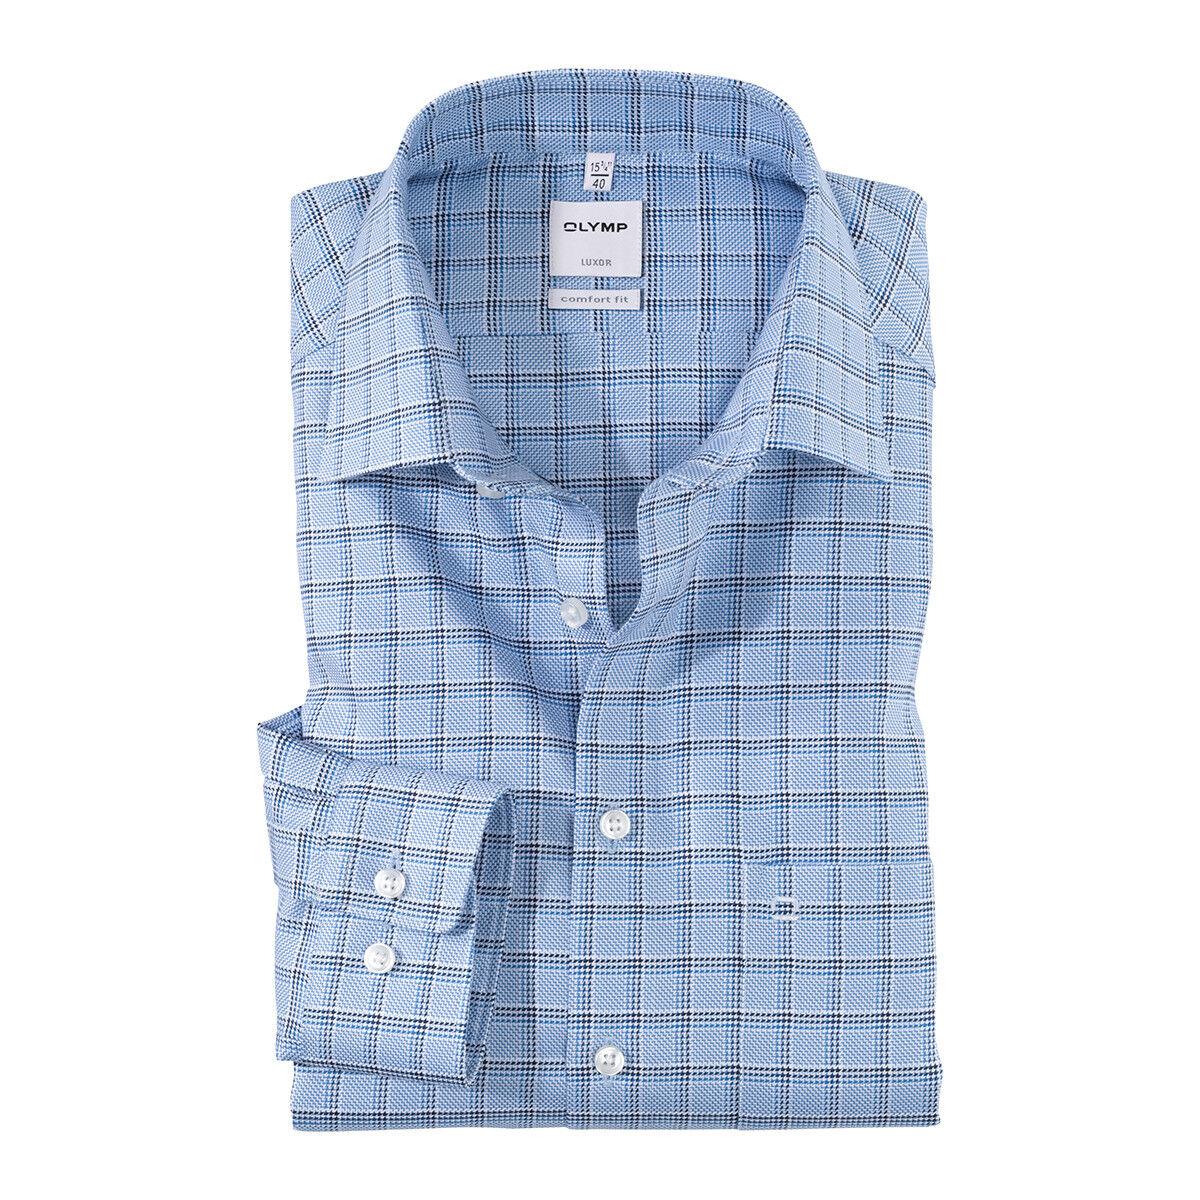 XXL Olymp Langarmhemd Muster hellblau-violett kariert 44 46 48 50 NEU Übergröße